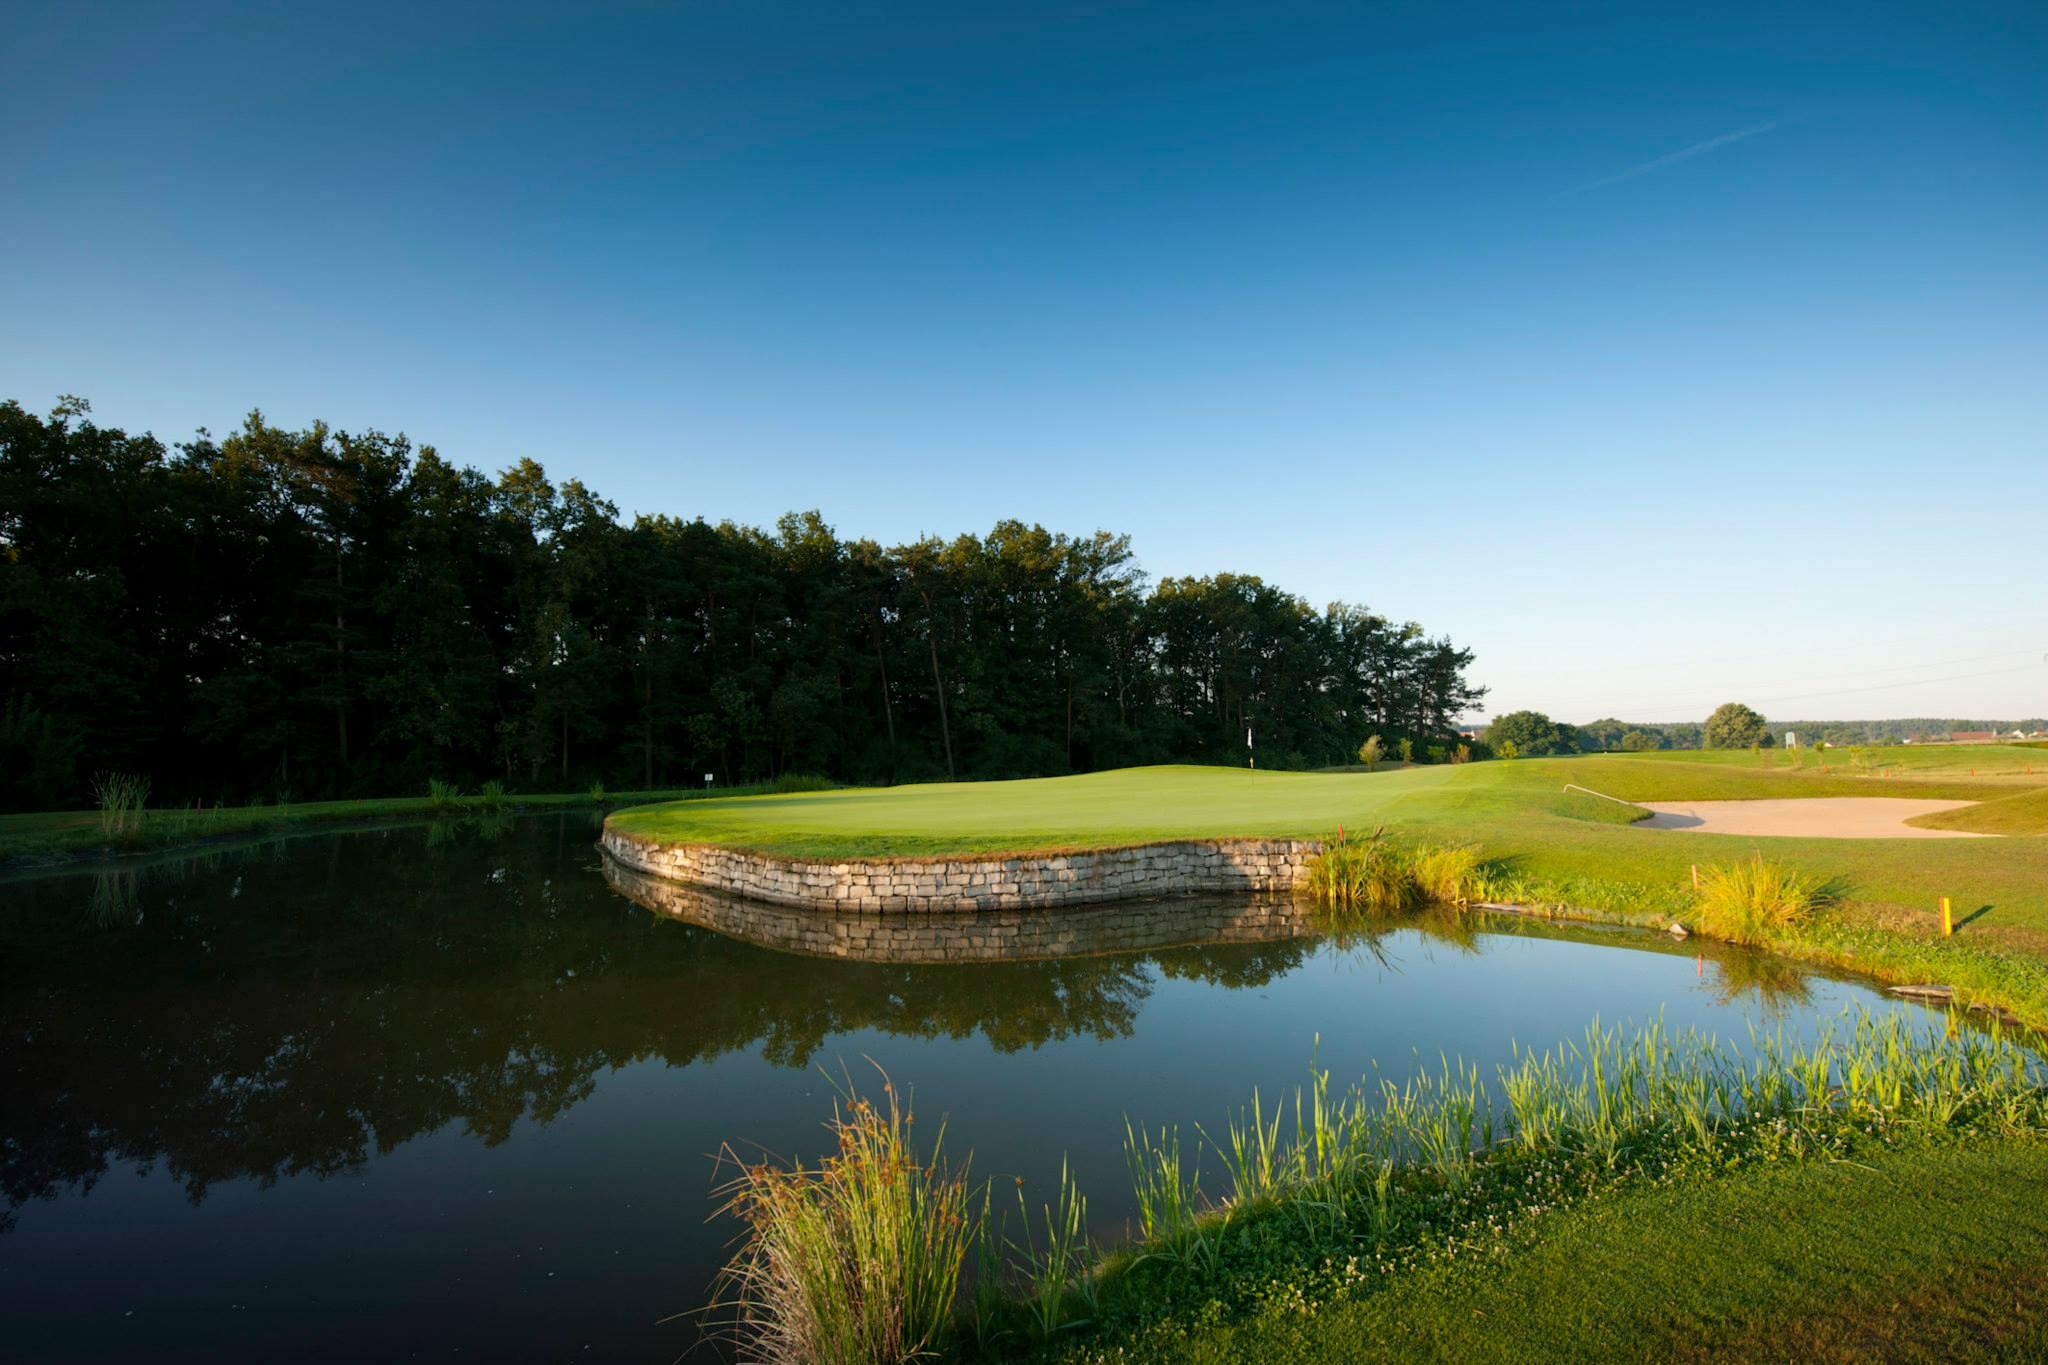 Overview of golf course named Golf-Club Herzogenaurach e.V.